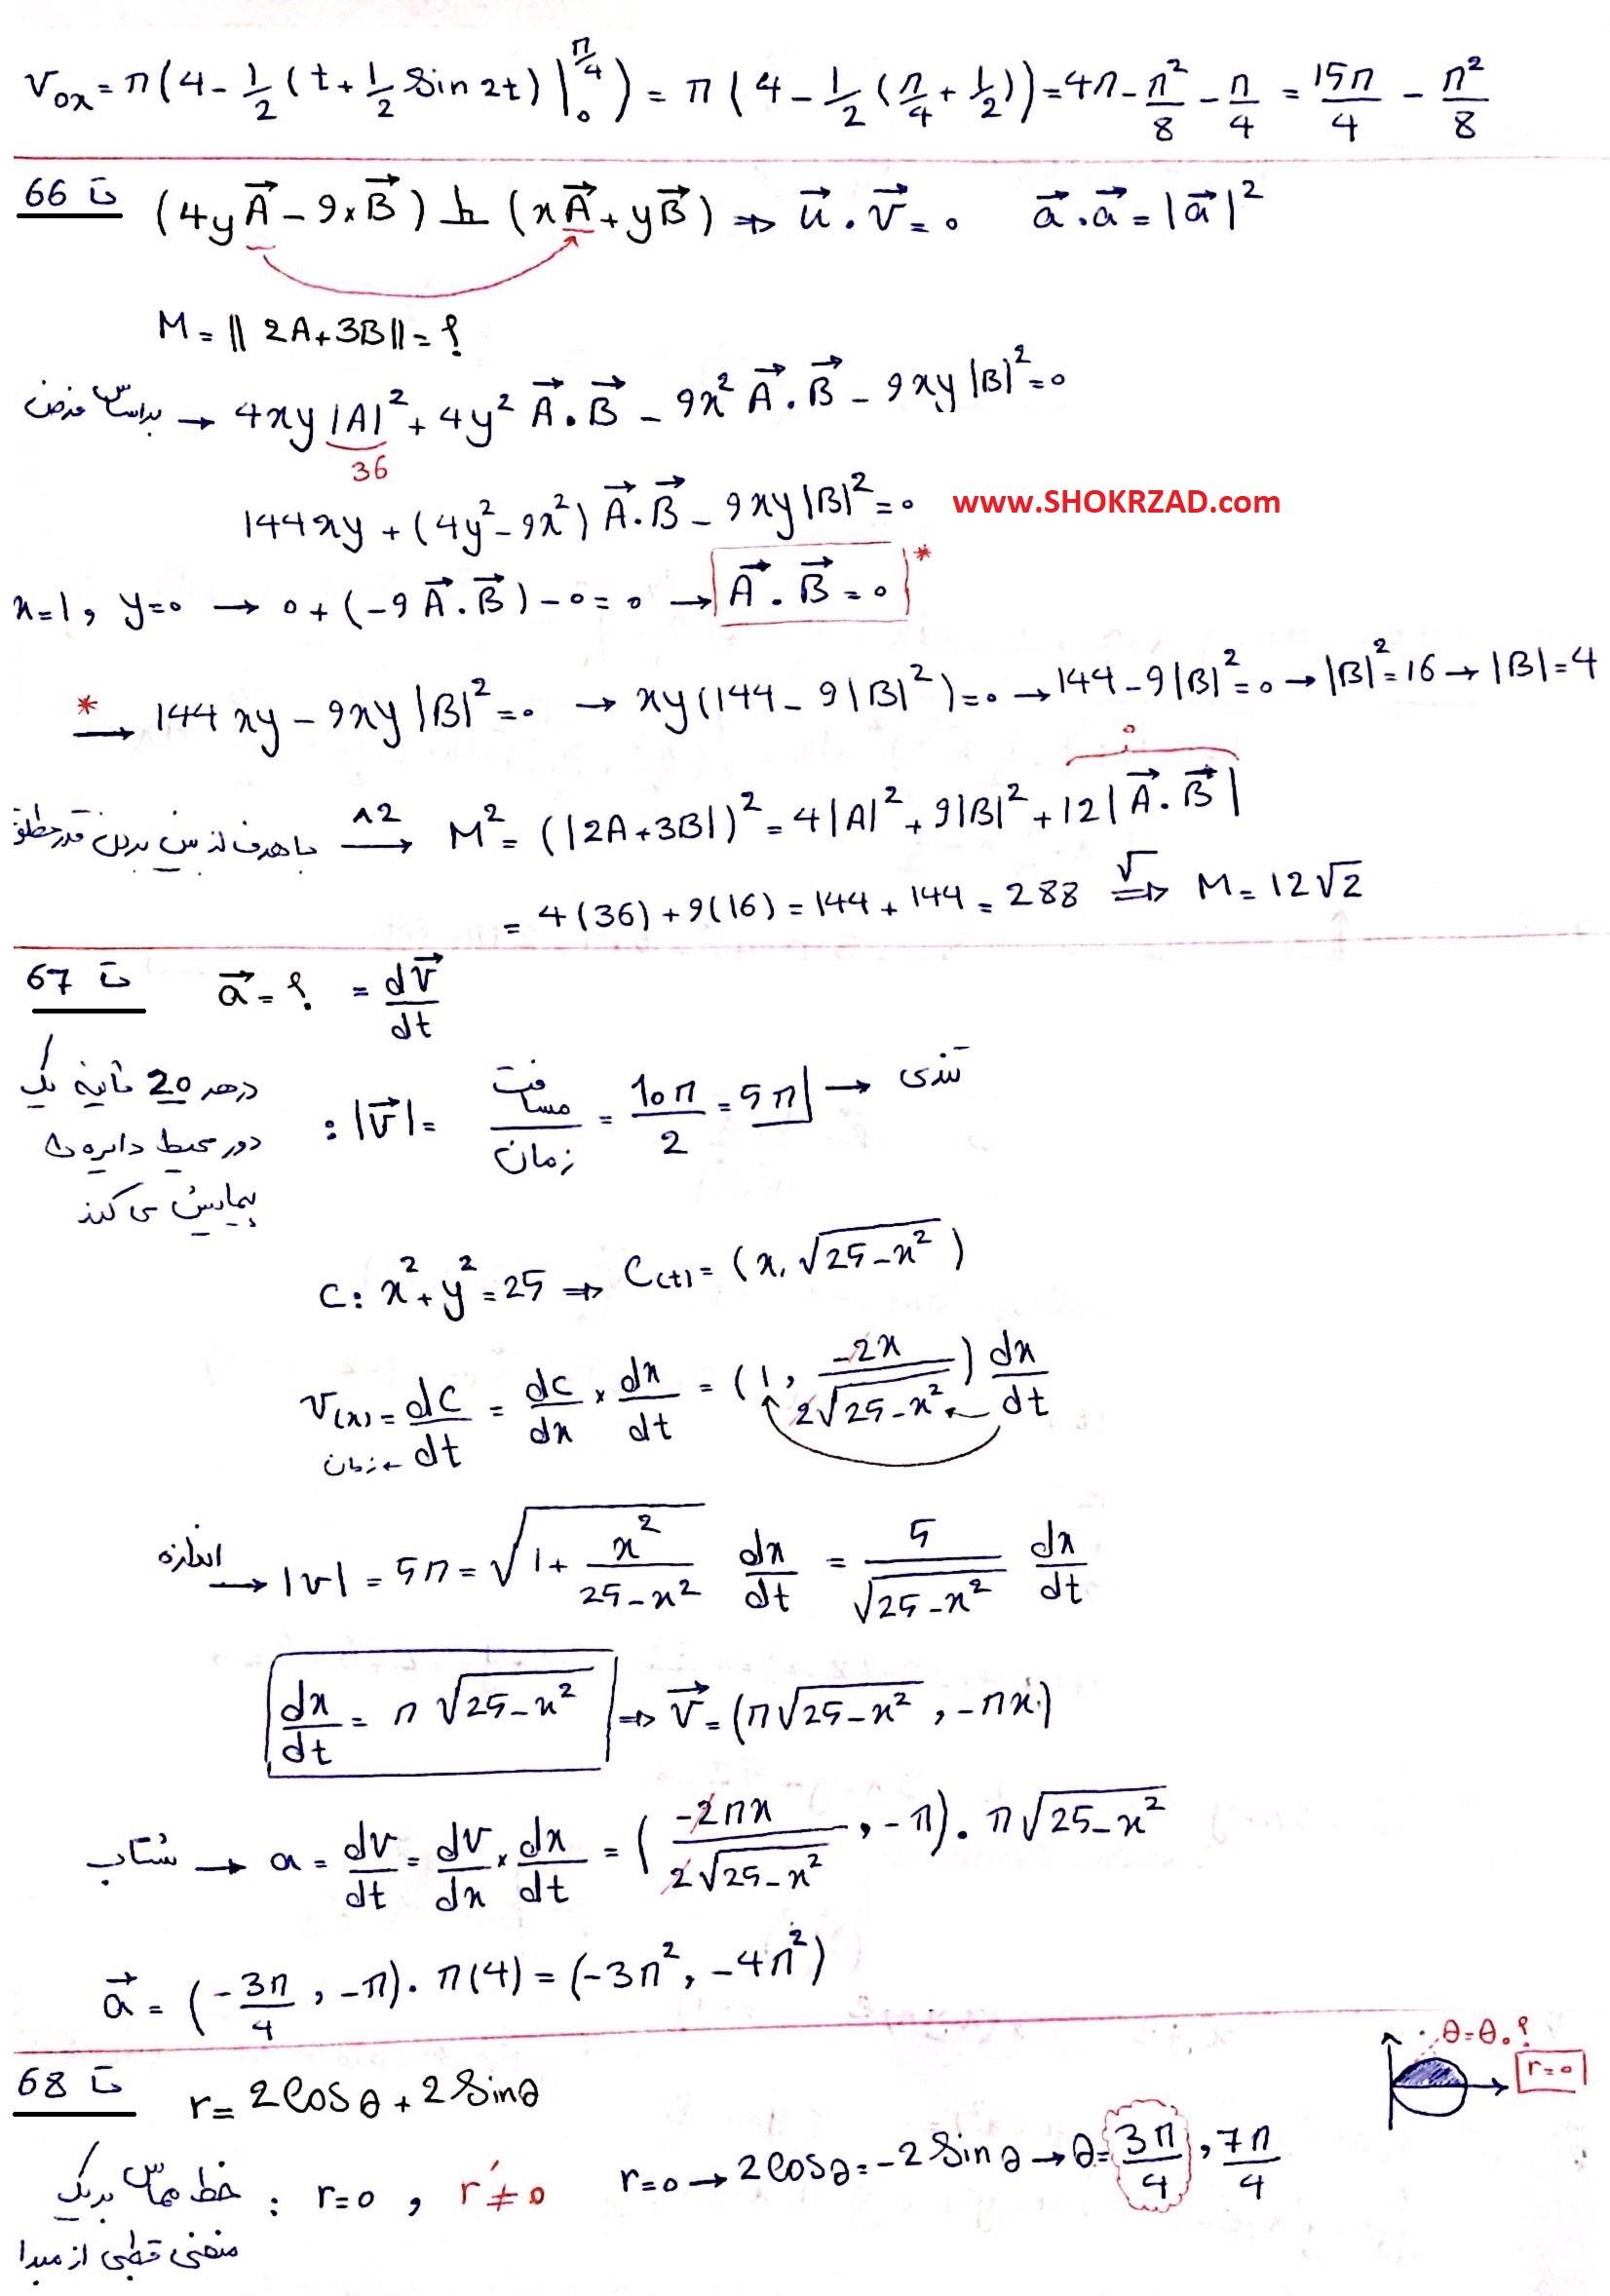 پاسخ تشریحی سوالات ریاضی ارشد فلسفه علم 97